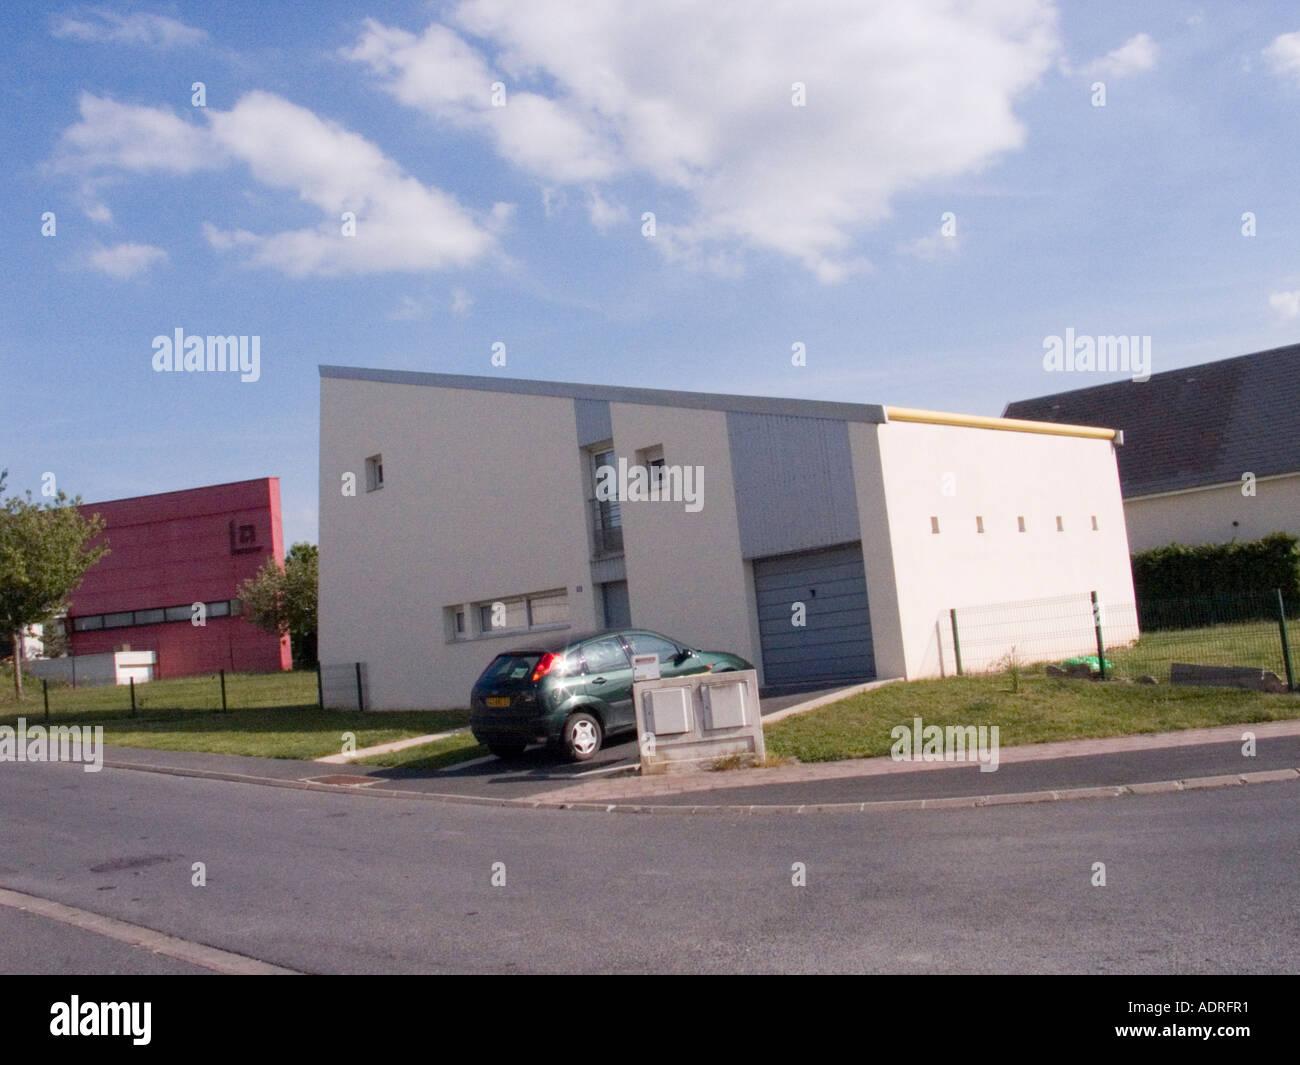 Alamy & Unusual modern house Reims France architect designed Stock Photo ...